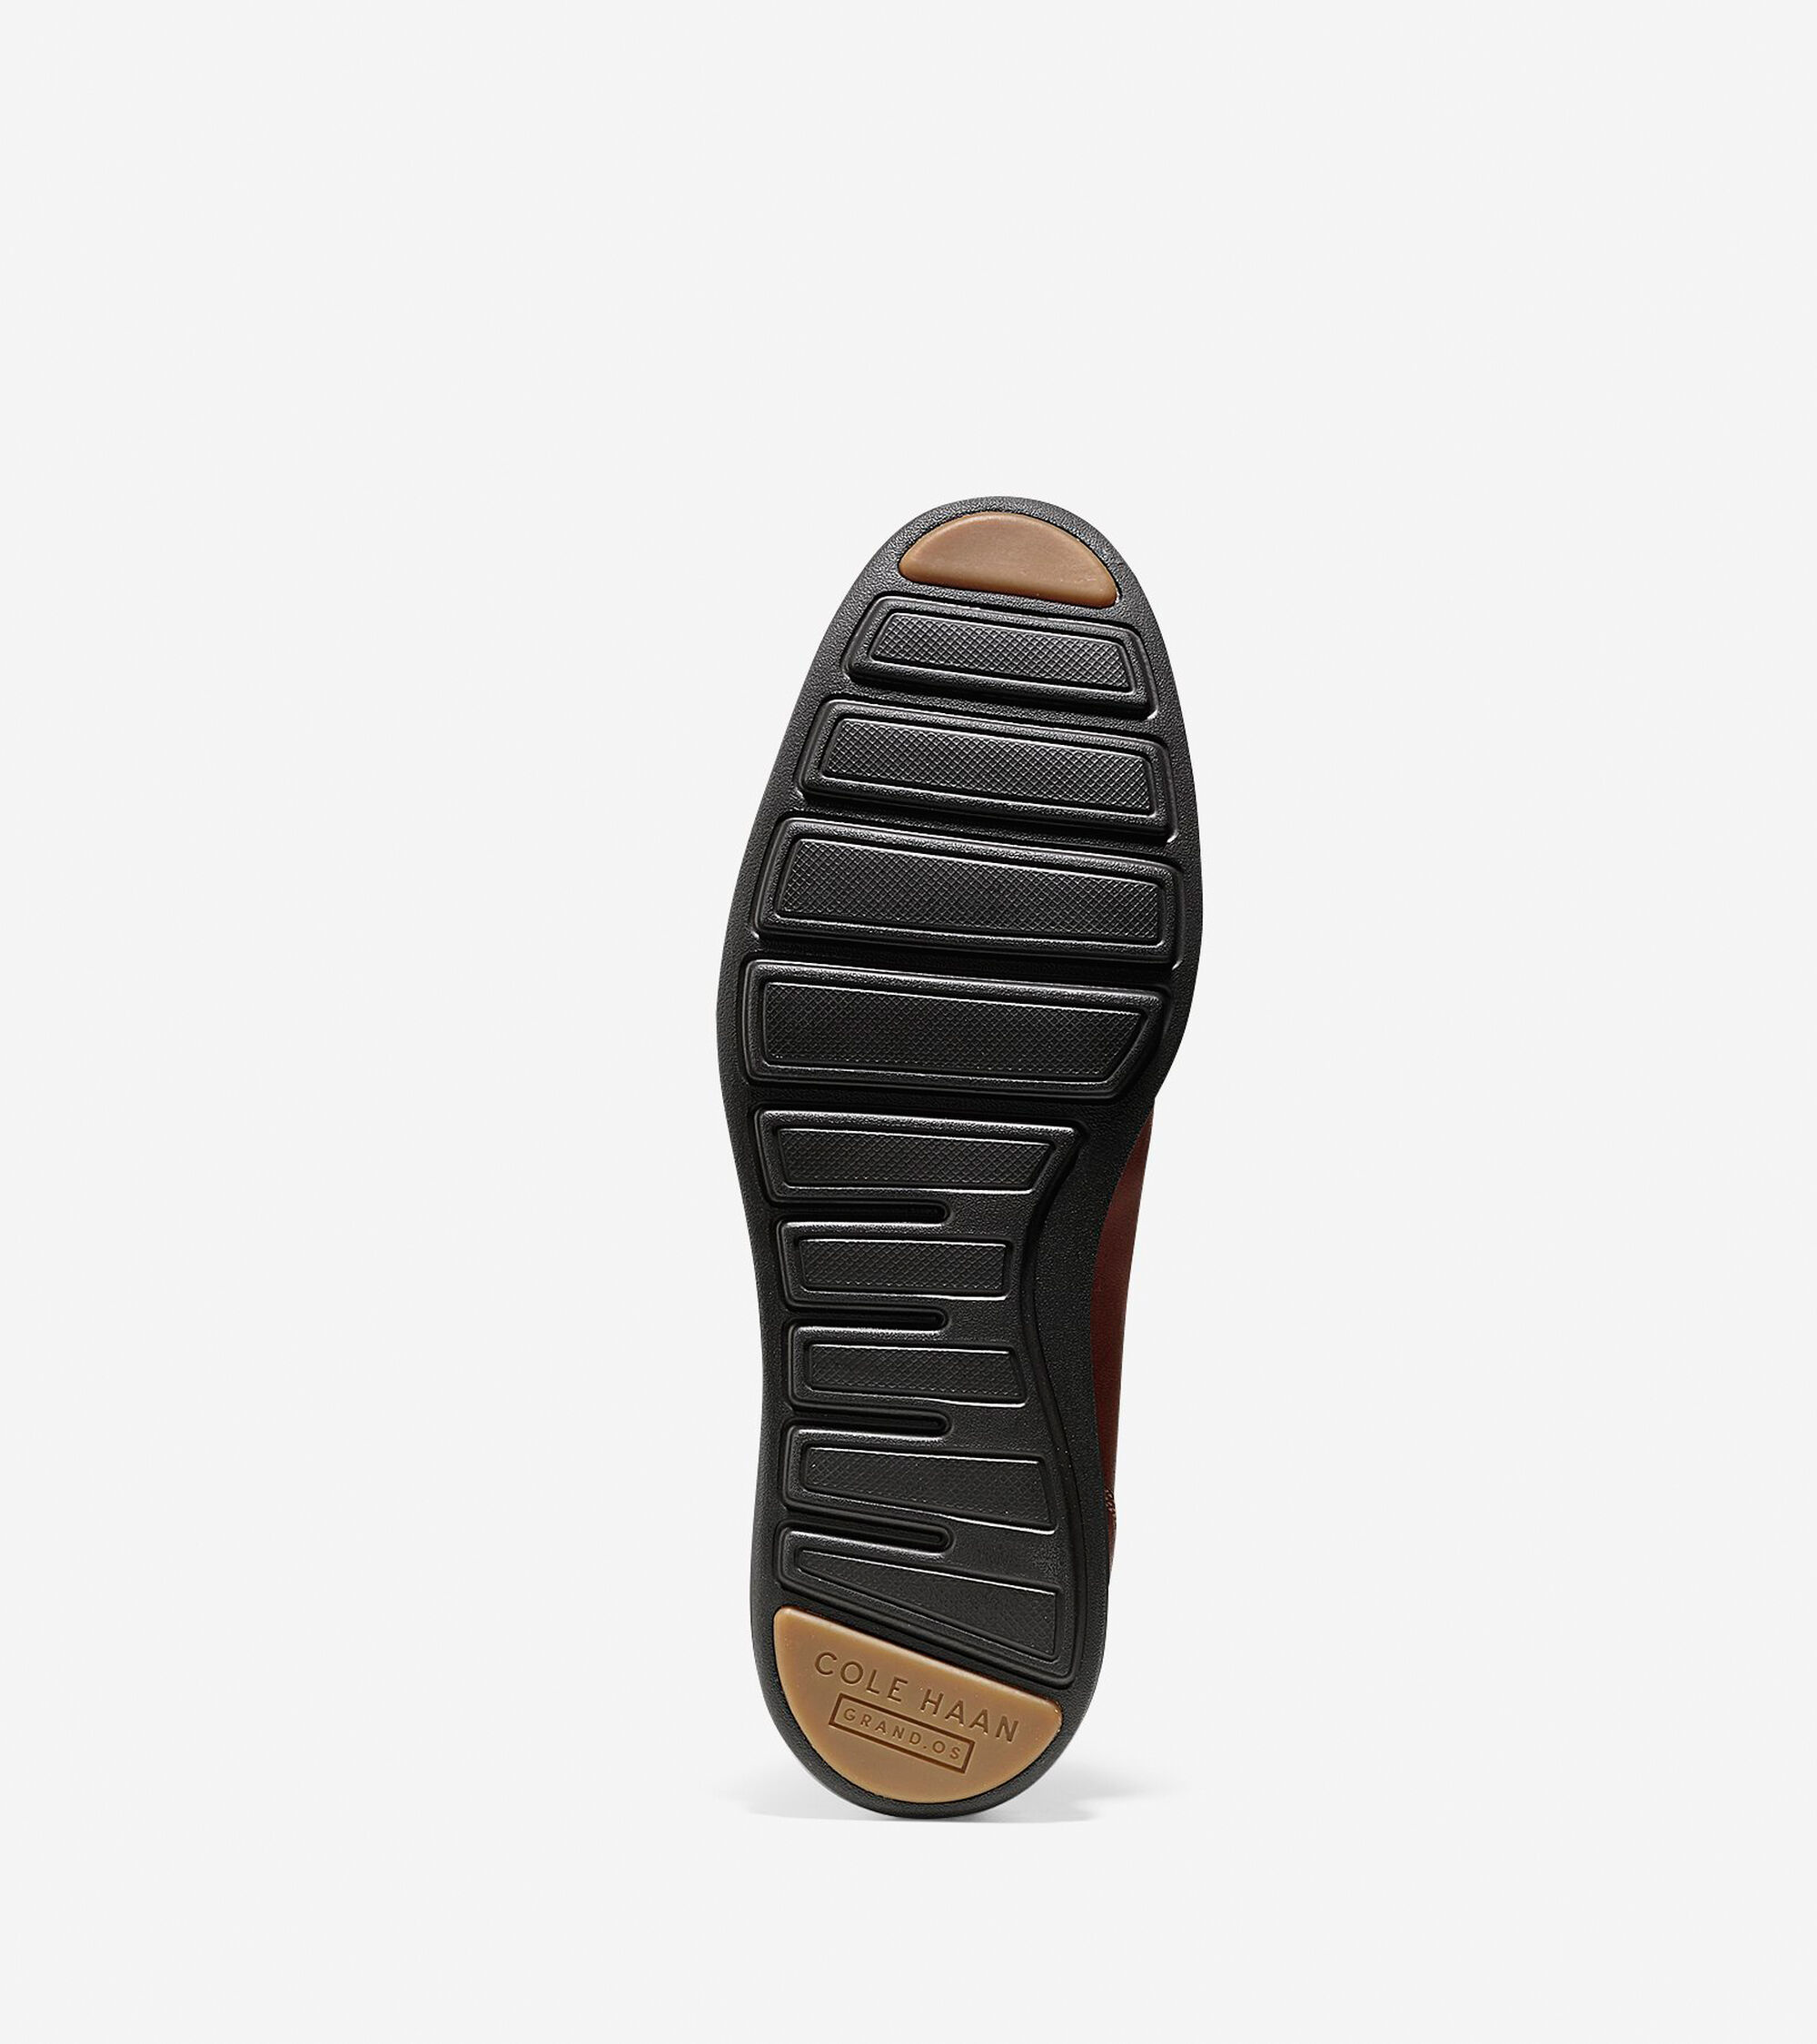 a83e68ae8f5 Men s OriginalGrand Venetian Loafers in Woodbury-Java